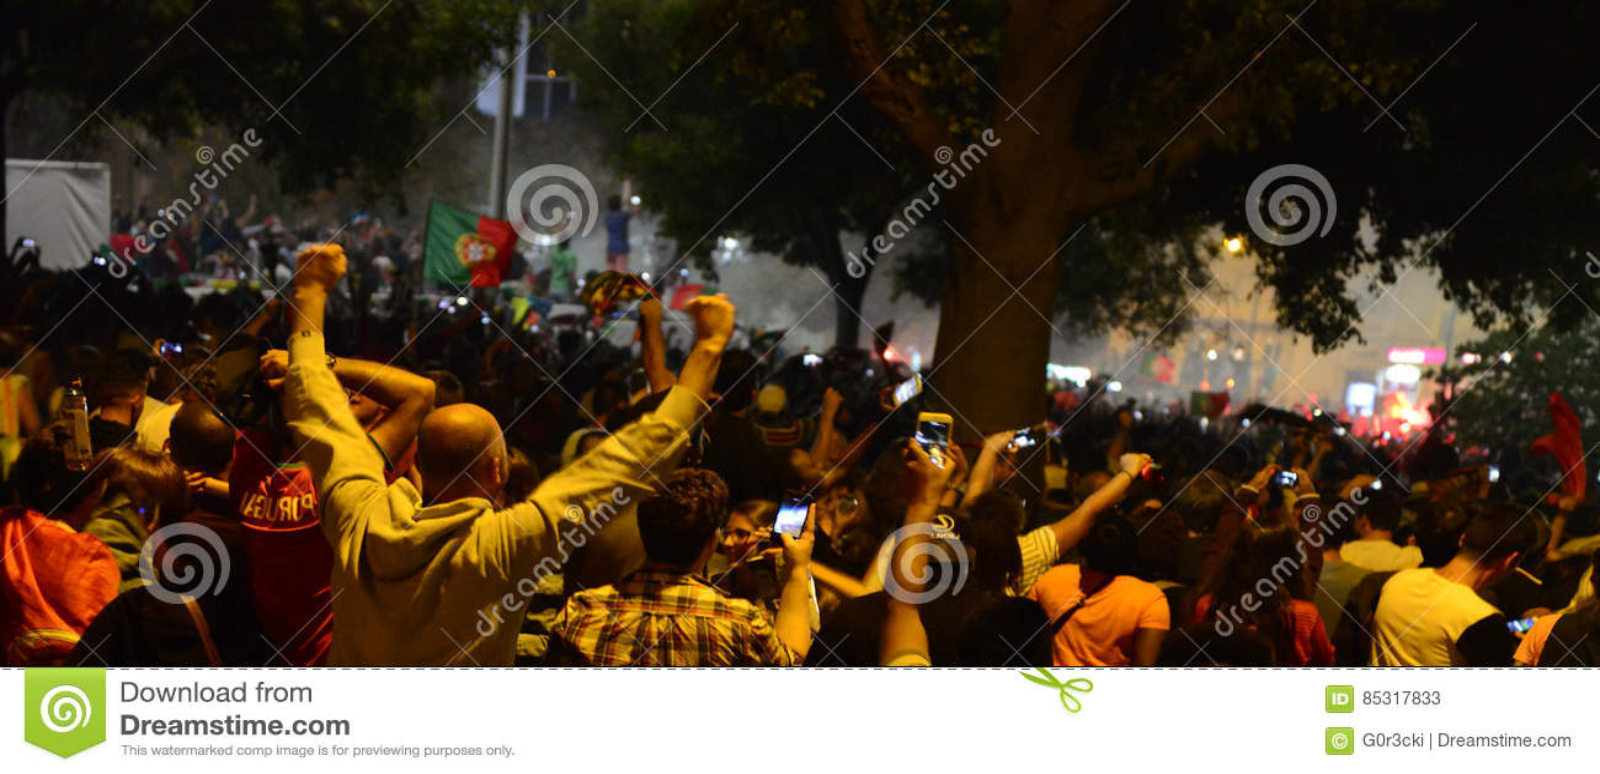 Crowd Celebrating Victory, Portugal Flag, Lisbon - UEFA European Soccer Championship Final